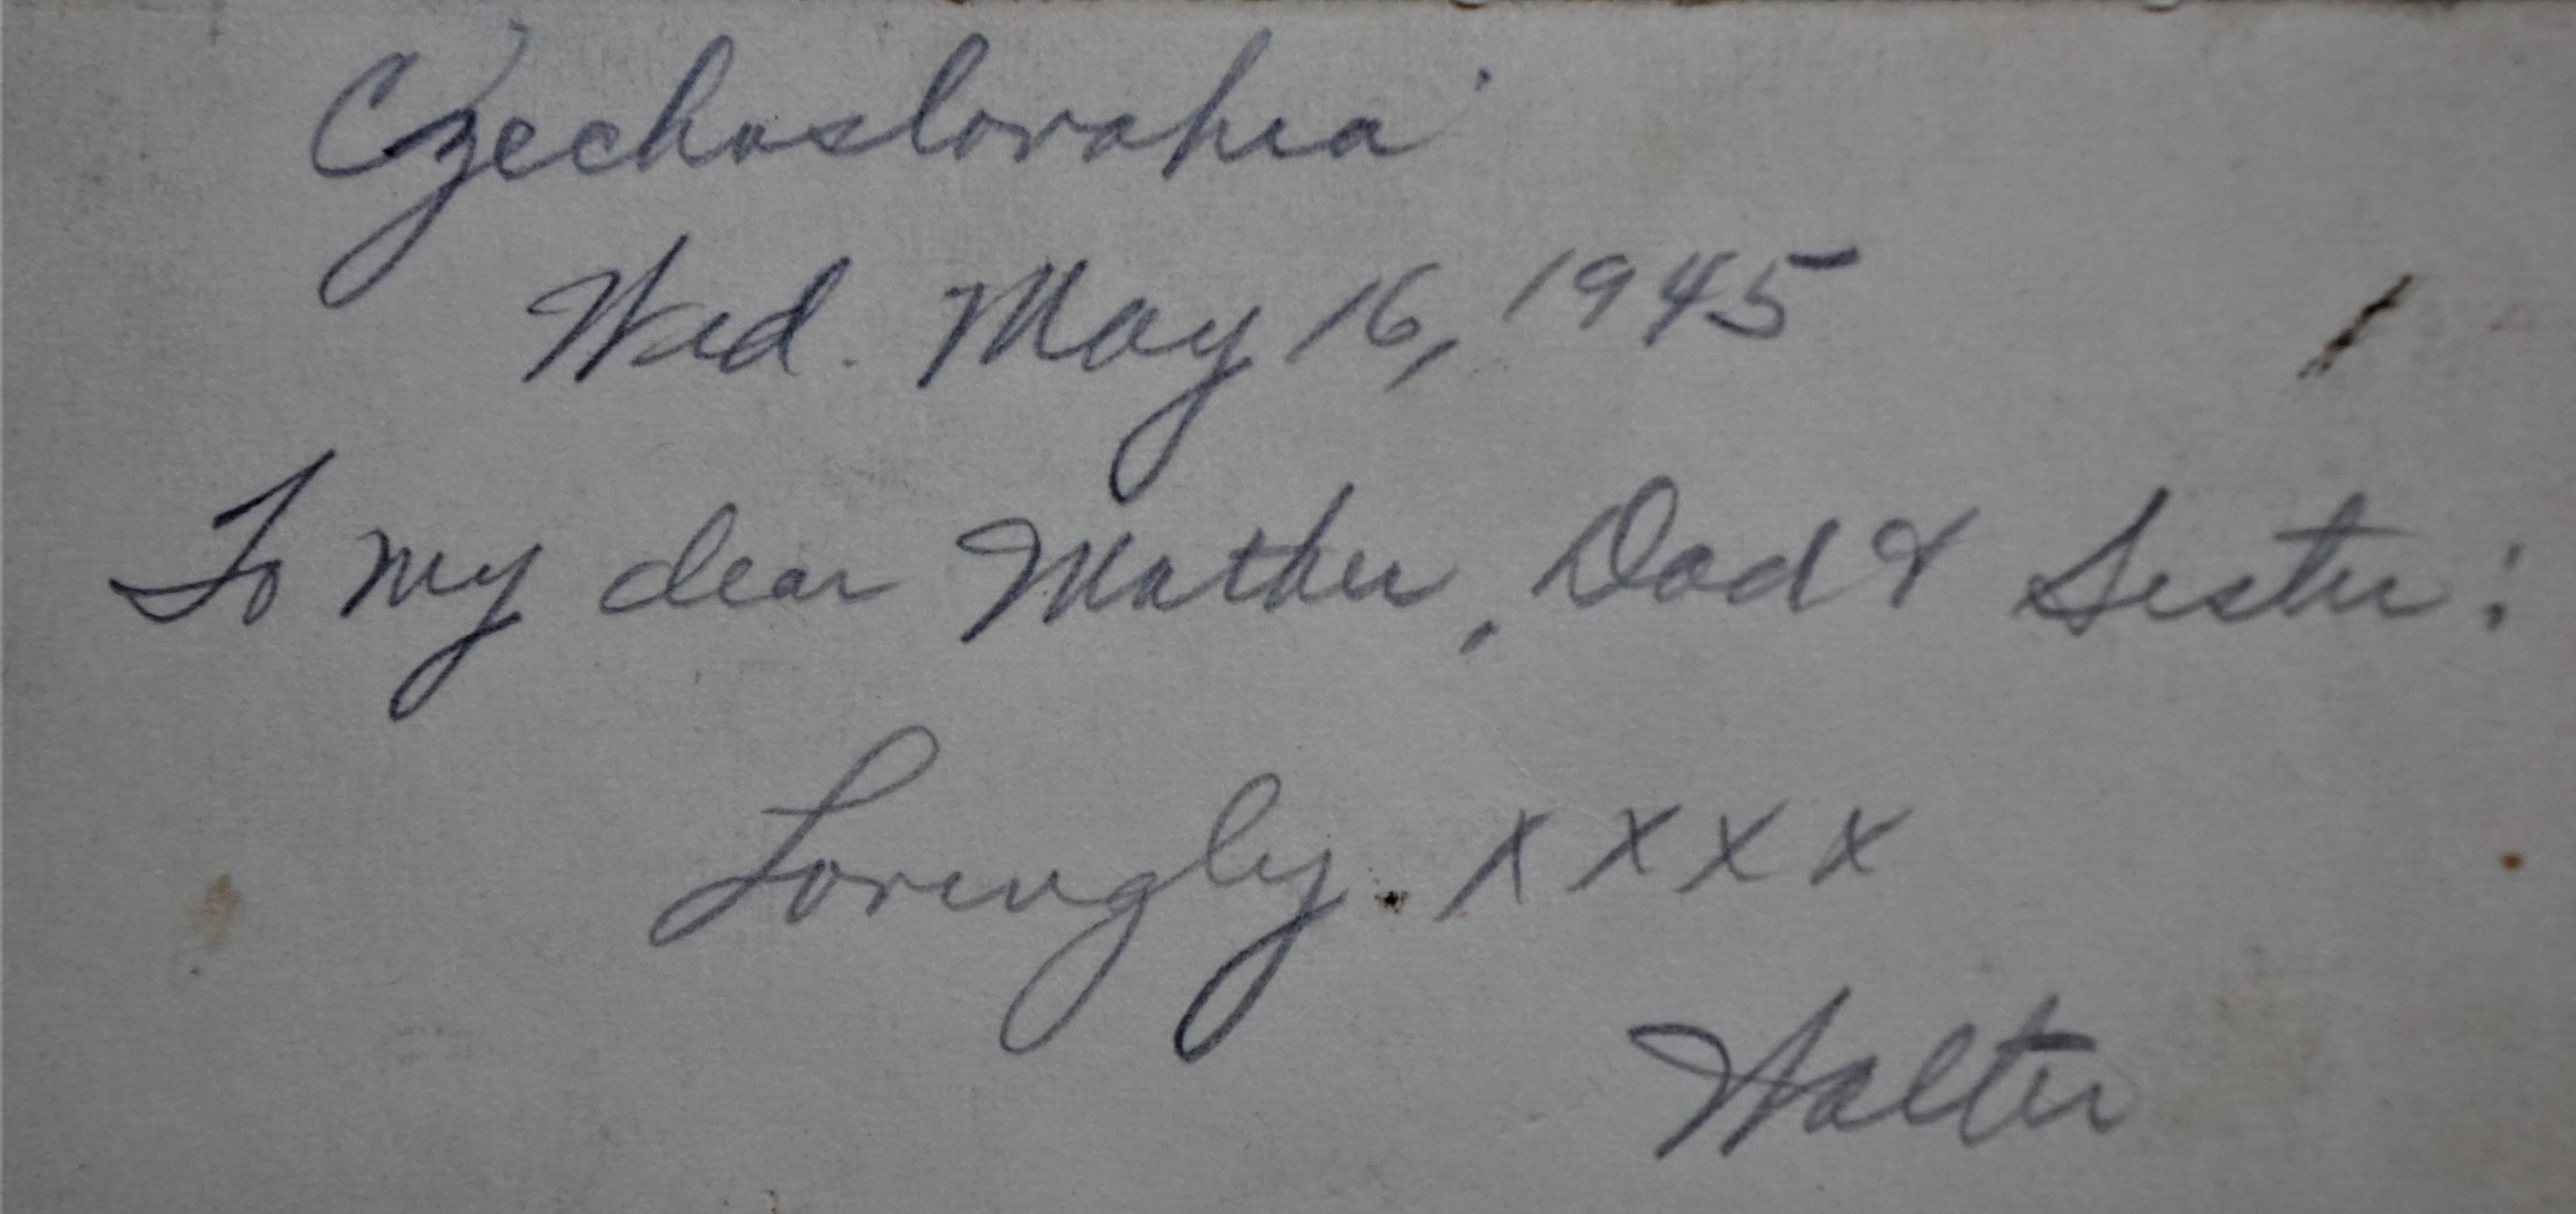 WalterJohnsonHandwriting_Czechoslovakia_May_16_1945 (3)